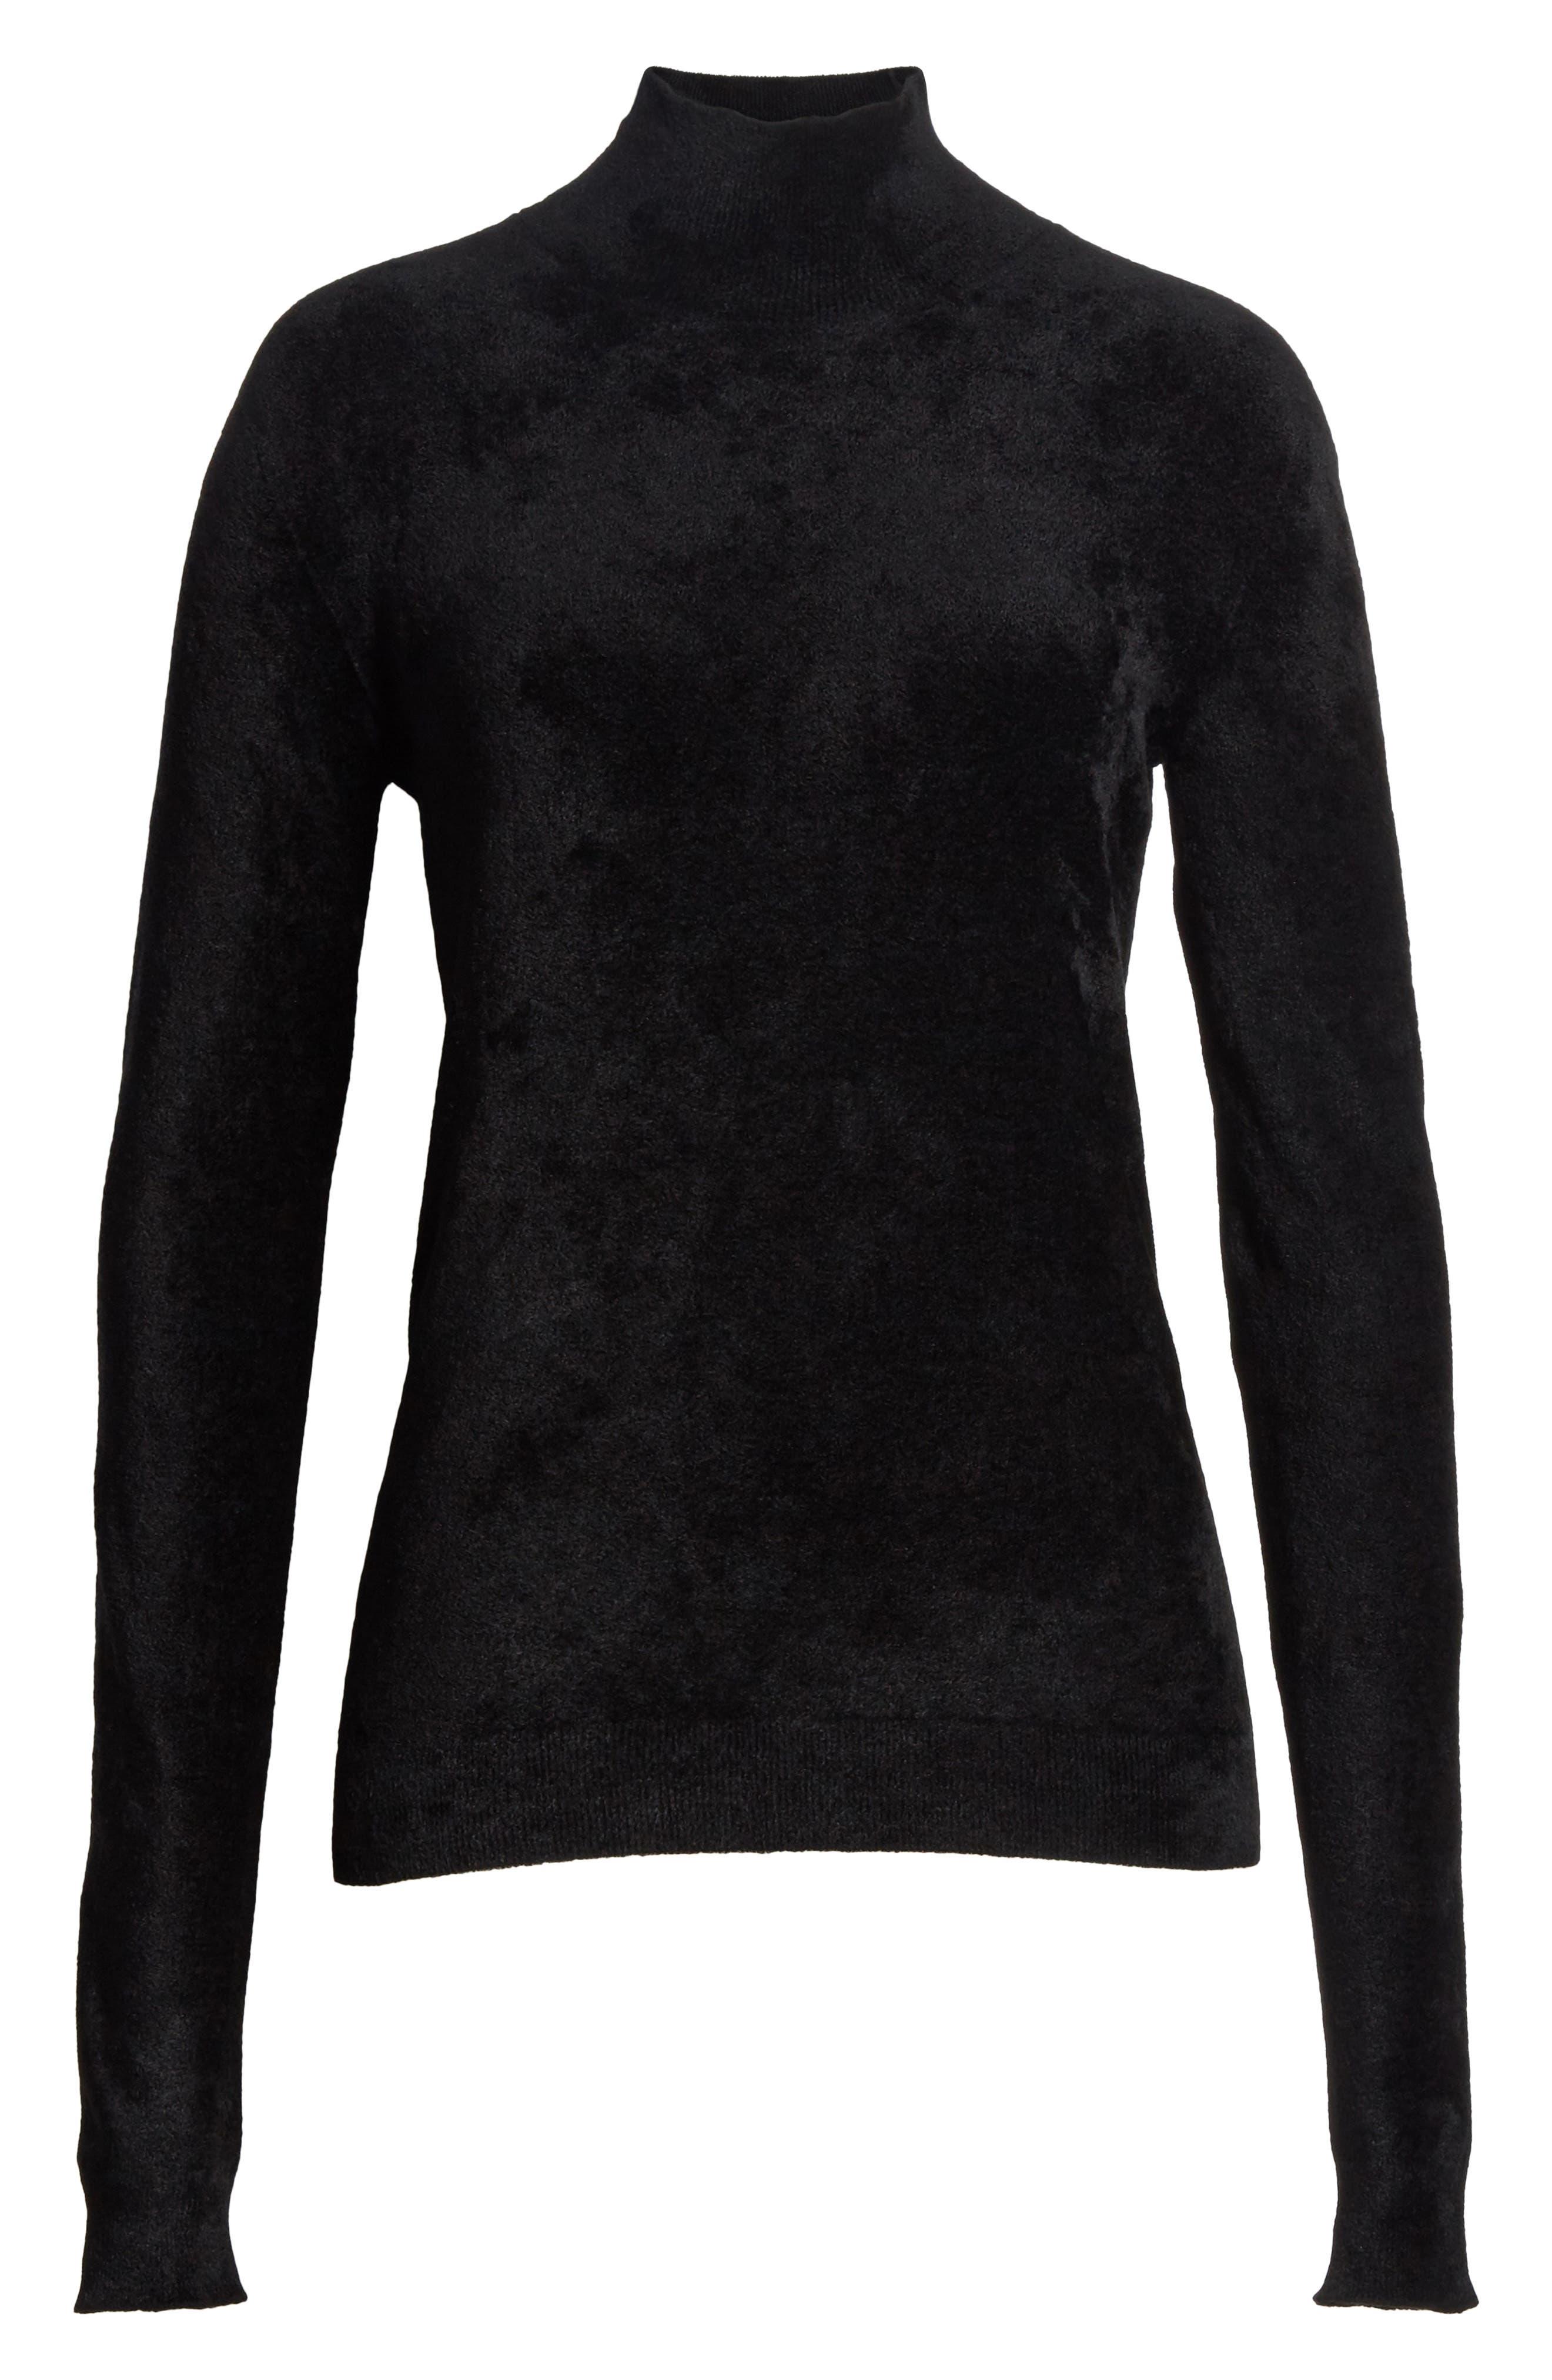 Chenille Turtleneck Sweater,                             Alternate thumbnail 6, color,                             00N99 Black